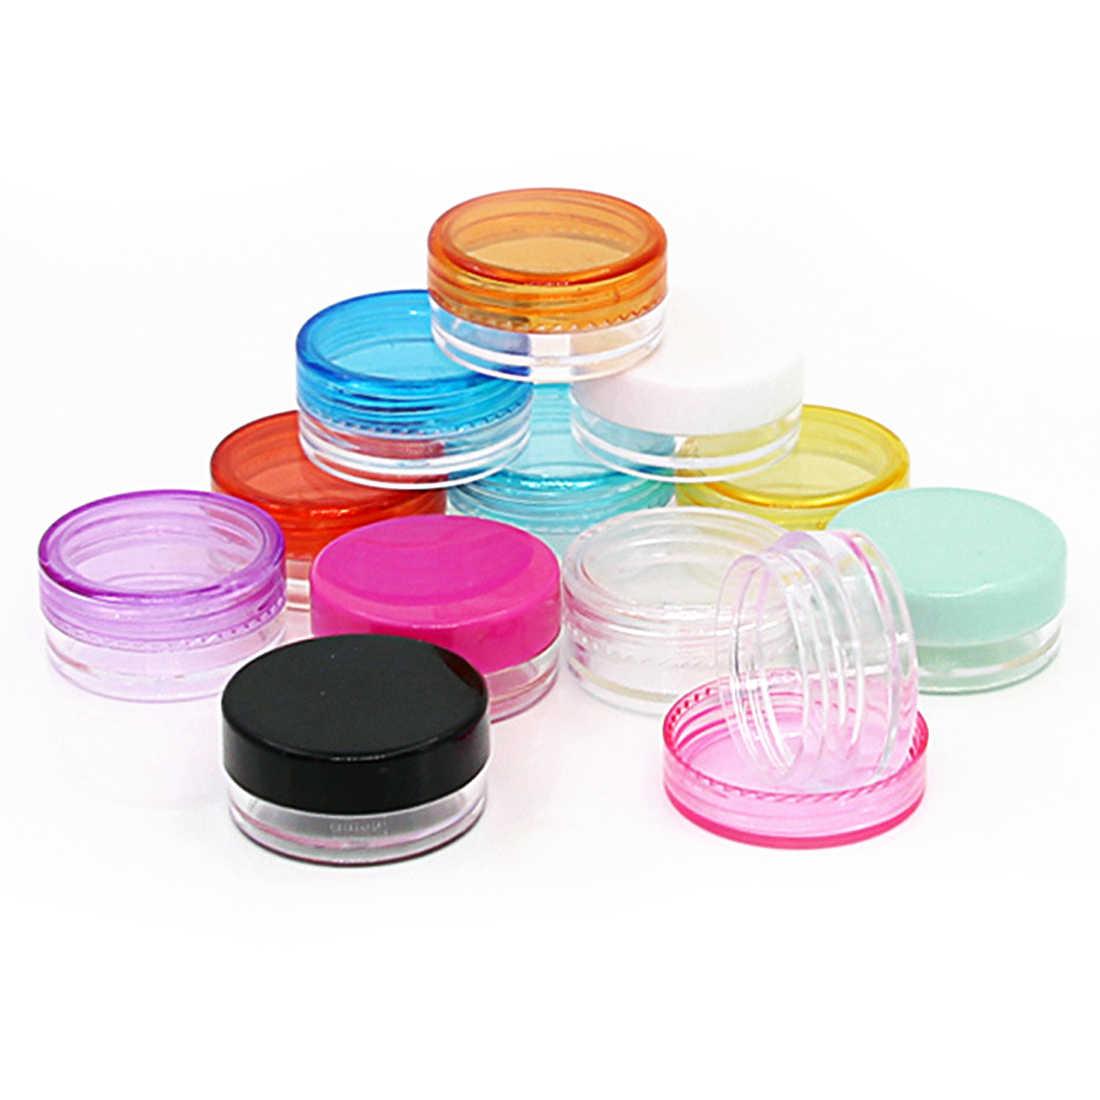 10pcs 5g Multi-color Mini Refillable Bottles Cosmetic Jar Pot Eyeshadow Makeup Bottle Face Cream Box Round Container Storage